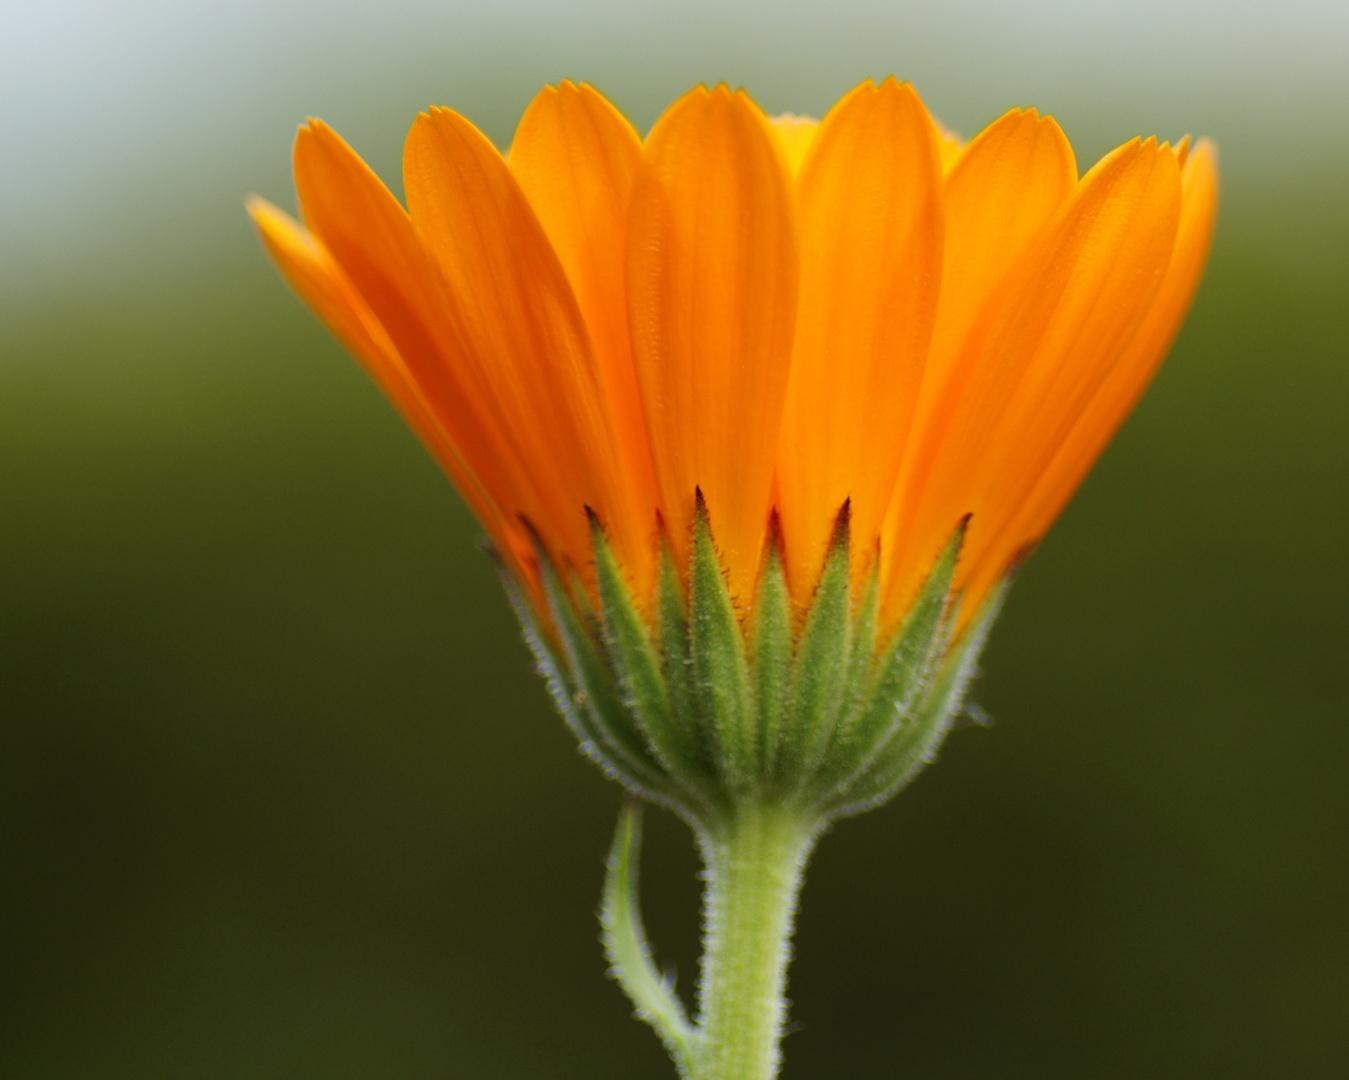 Makellose Blüte